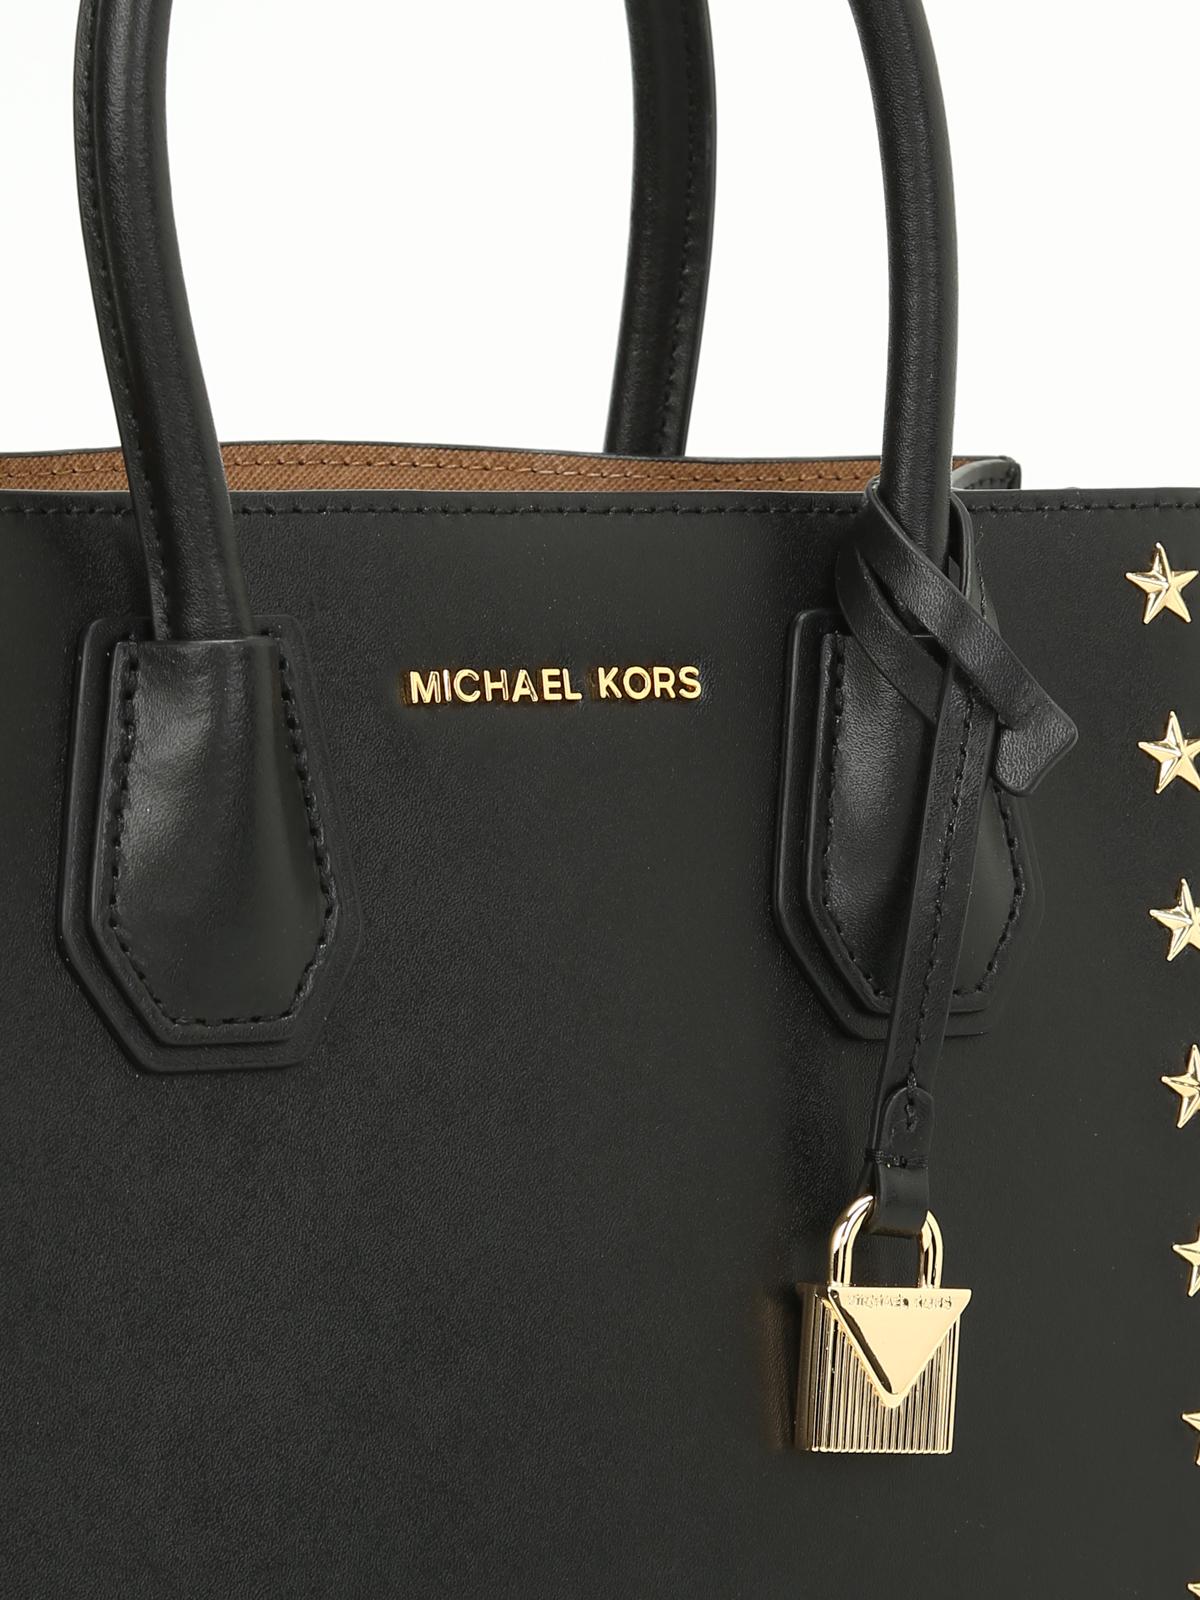 d21529e7b11b iKRIX MICHAEL KORS  cross body bags - Messenger studded medium crossbody · Messenger  studded medium crossbody shop online  MICHAEL KORS